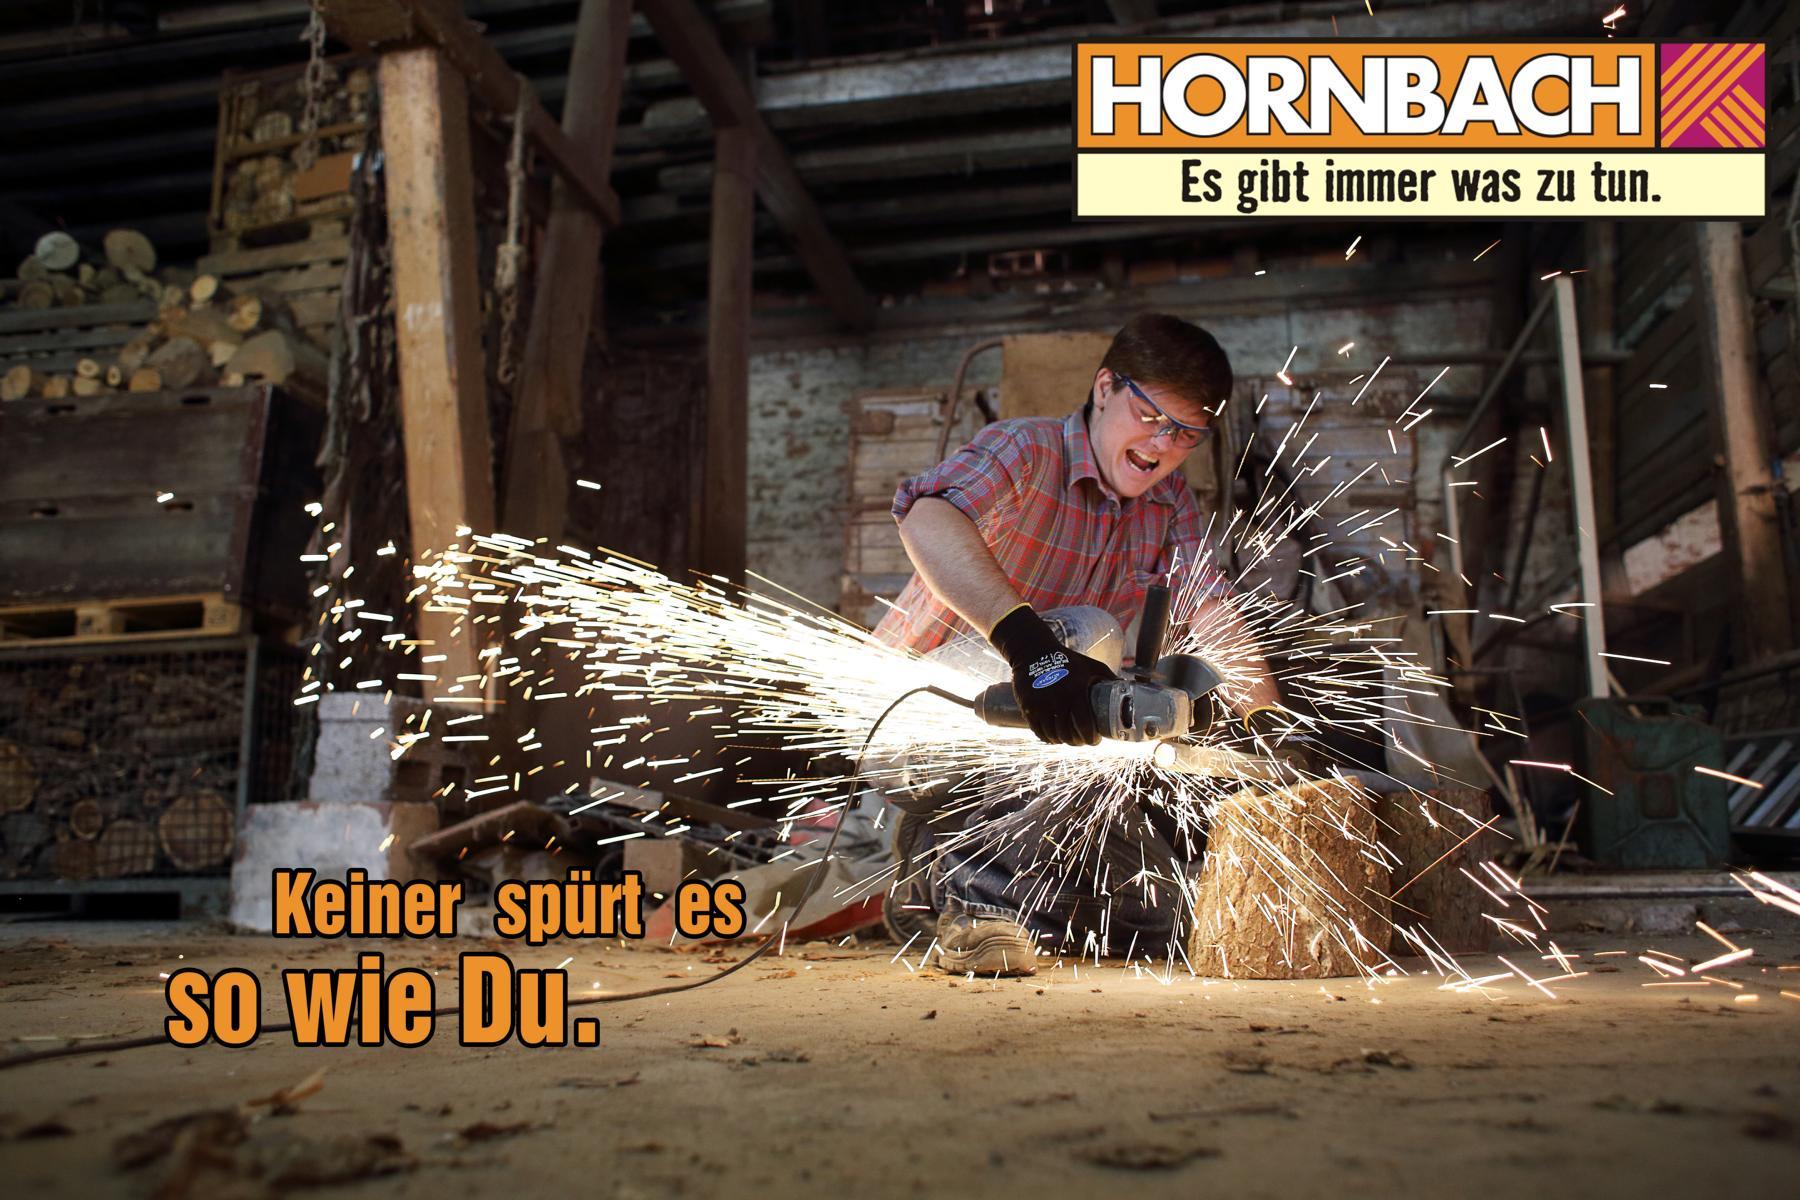 Call me Hornbach ;)